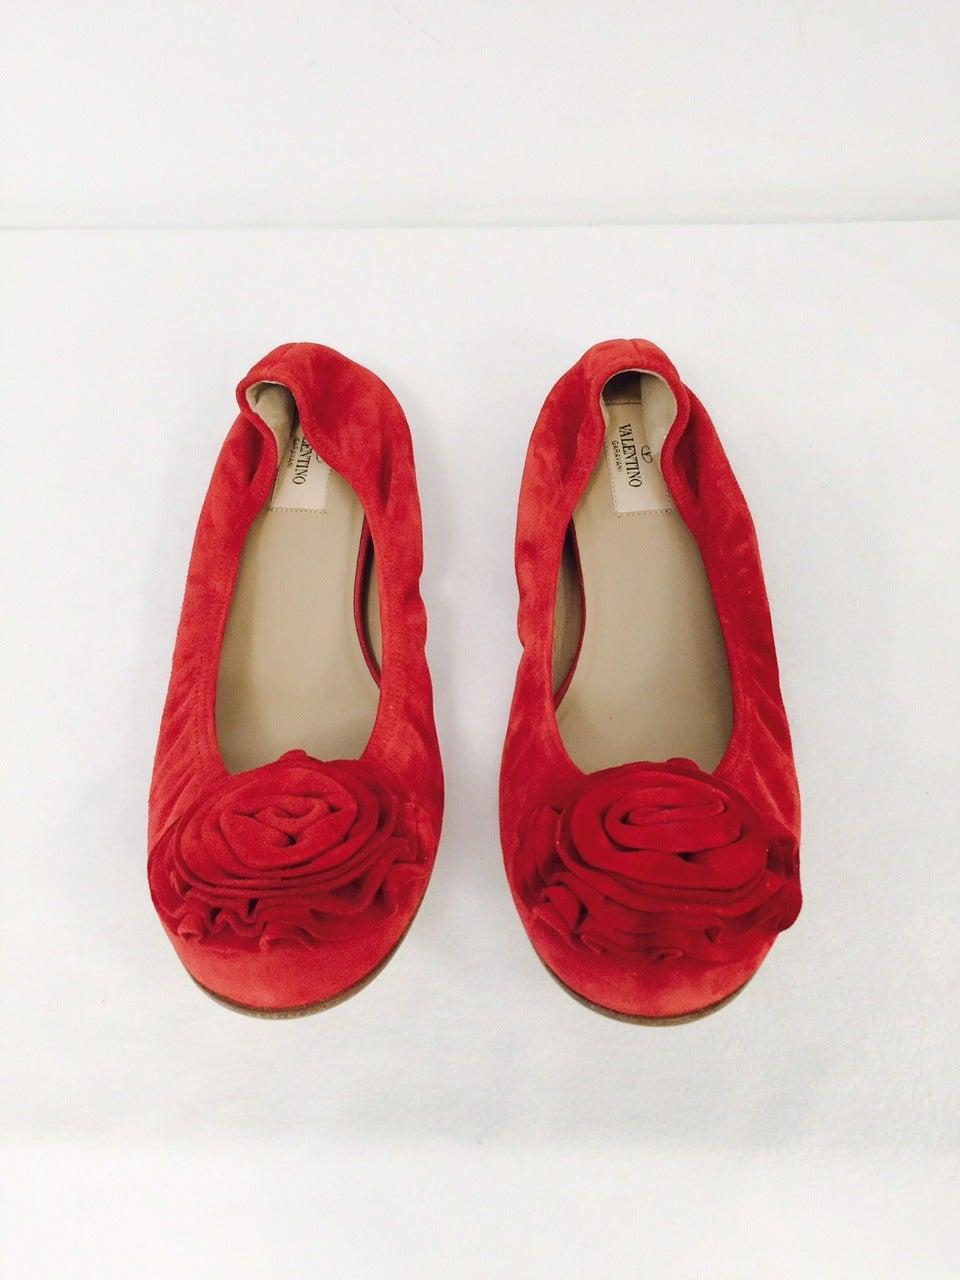 New Valentino Garavani Red Suede Ballerina Flats 5